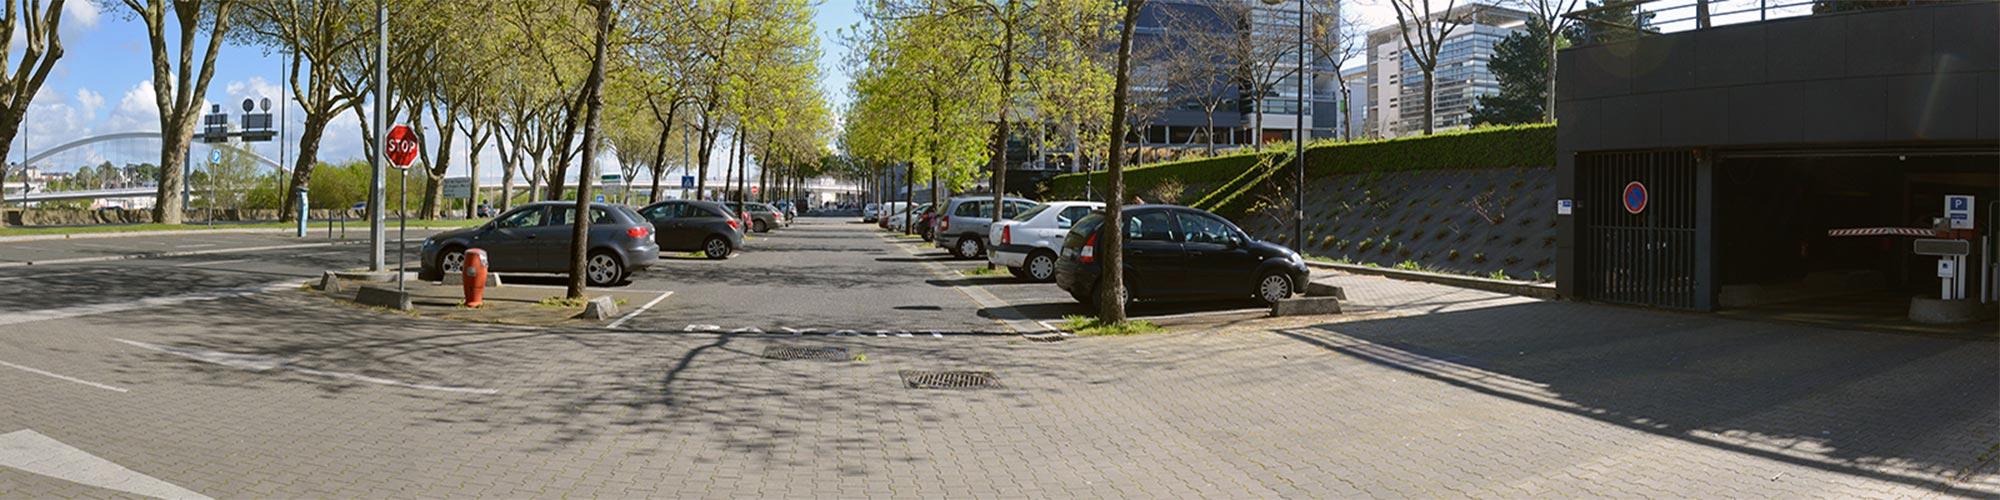 parking saint serge parkings angers stationnement angers alter services. Black Bedroom Furniture Sets. Home Design Ideas